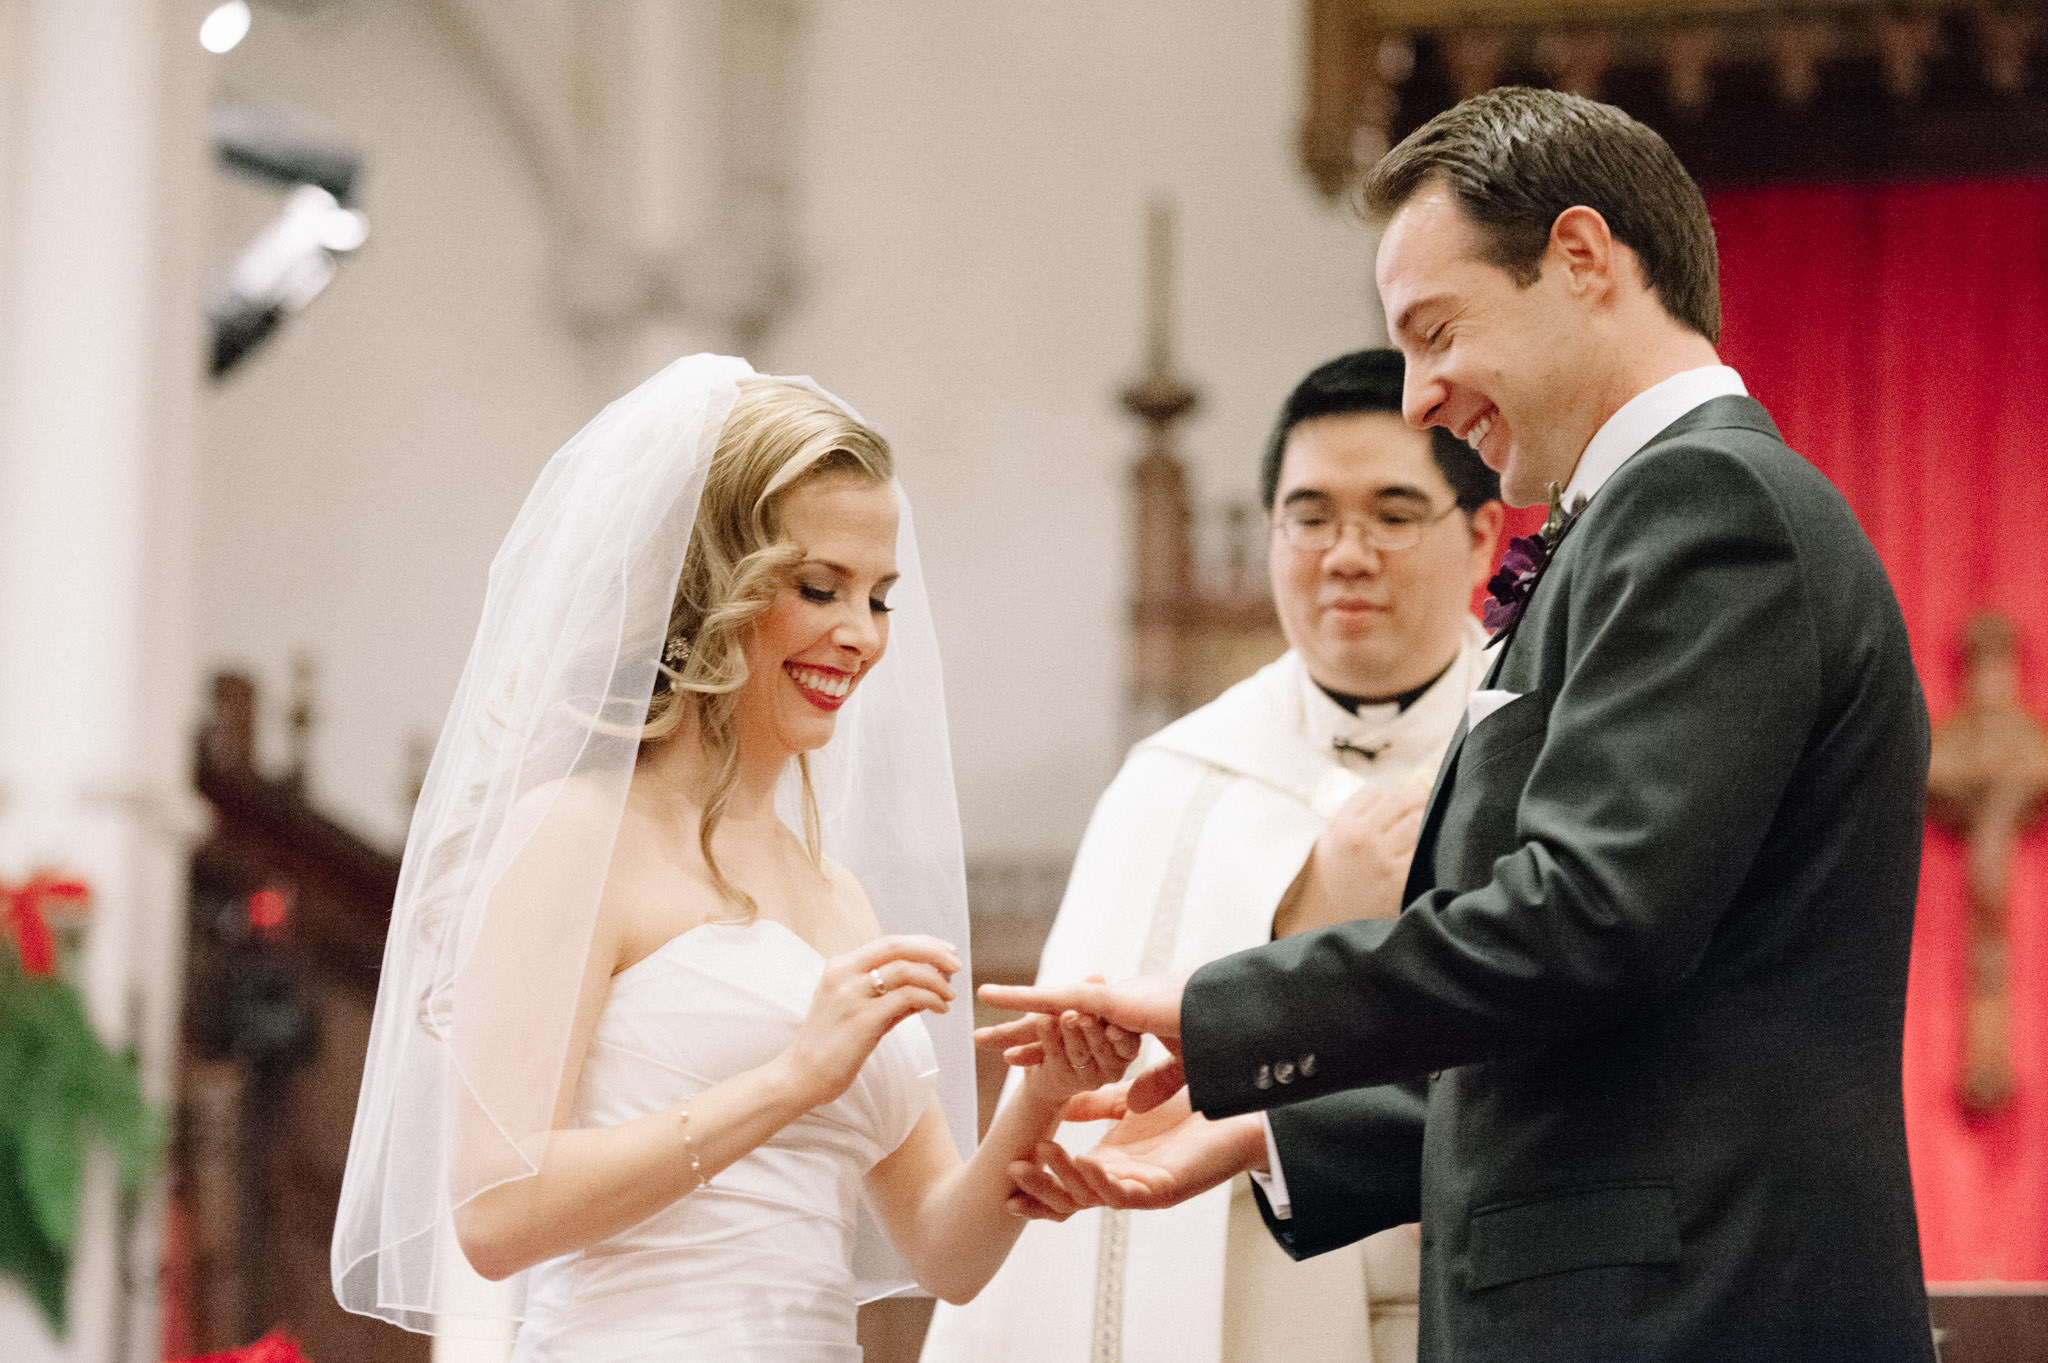 St. Basil's Church Toronto wedding